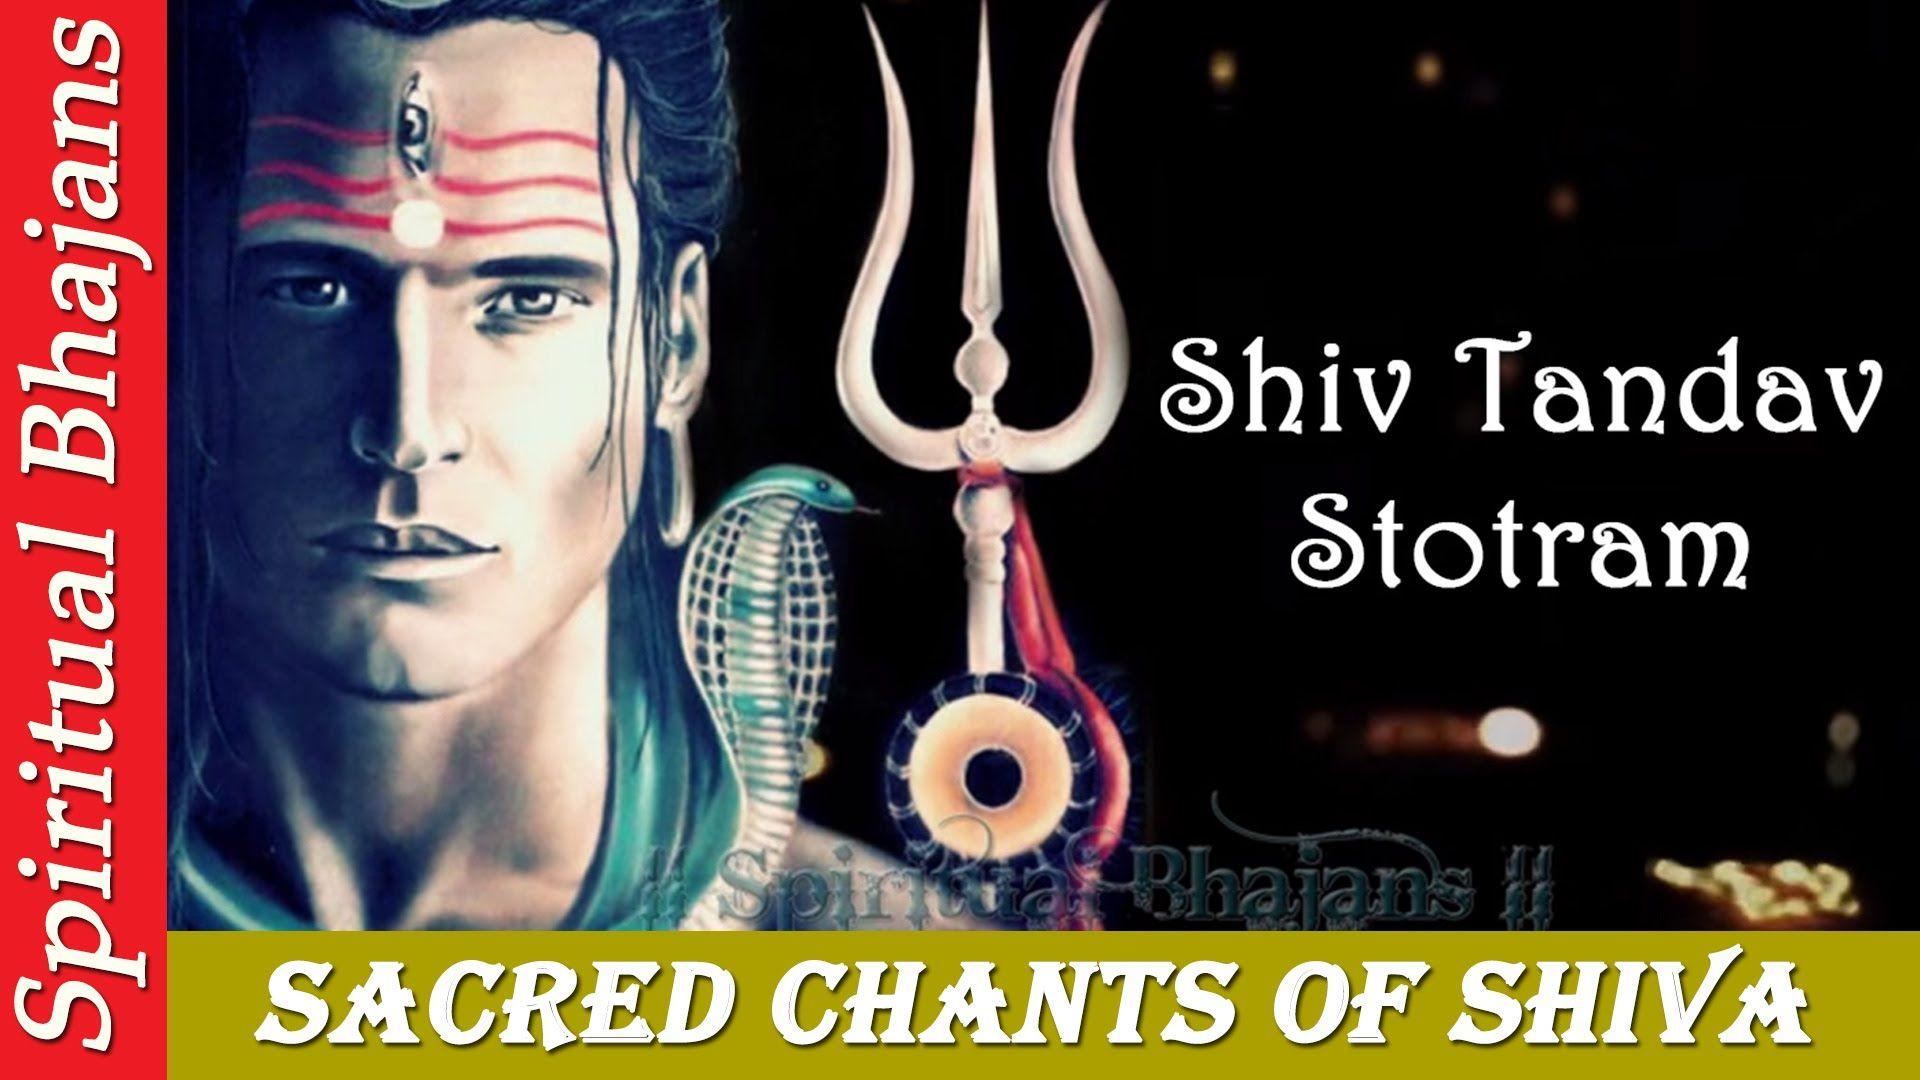 Shiva Tandava Stotram Sacred Chants Of Shiva Shiv Tandav Stotram Shiv Mantra Peaceful Shiv Tandav Sacred Shiva